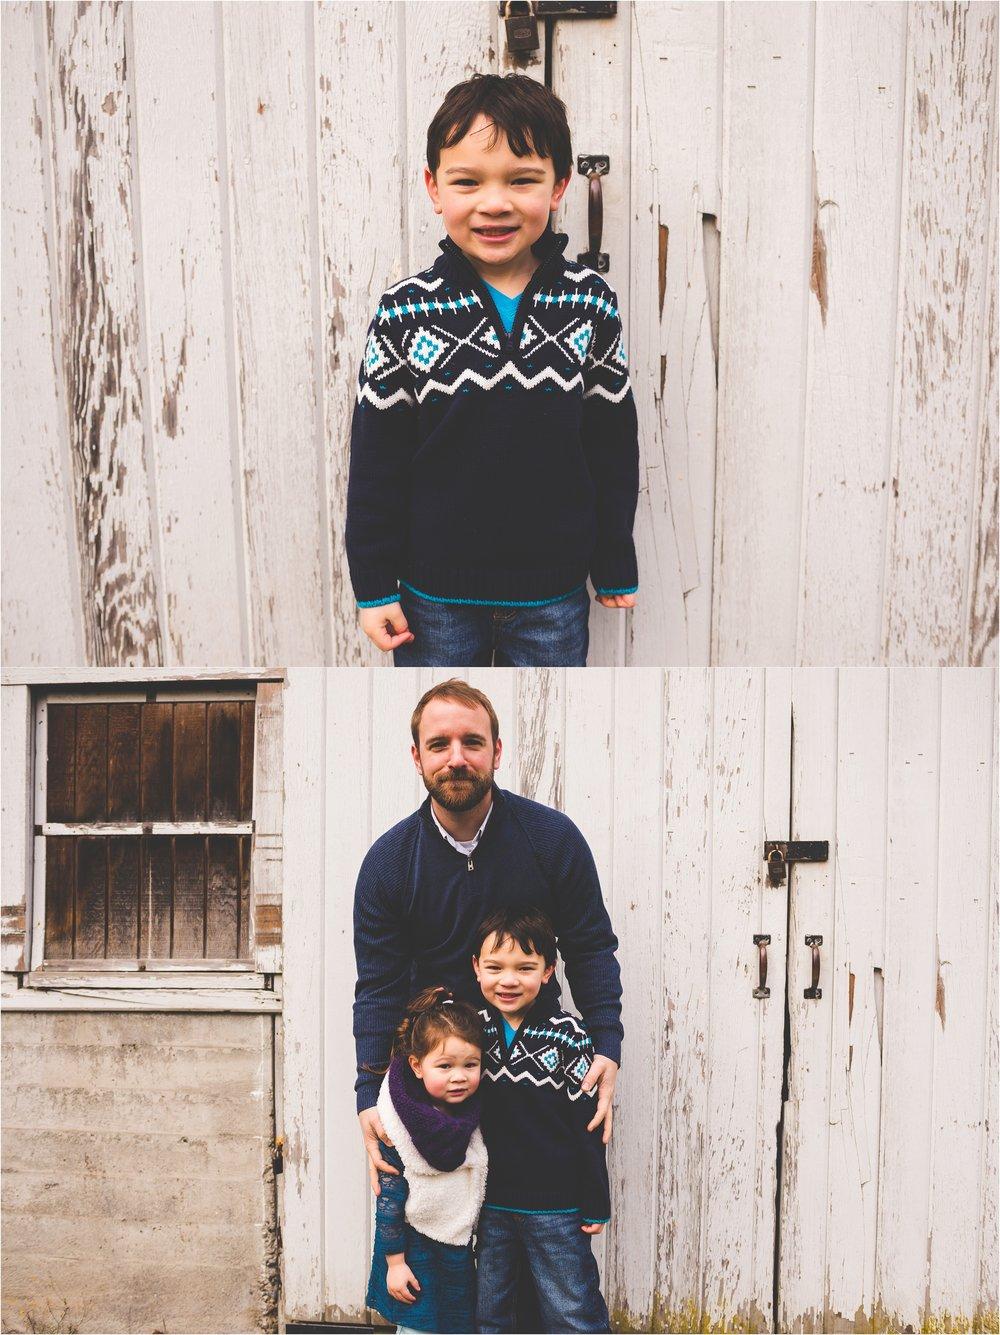 nisqually-wildlife-refuge-family-session-jannicka-mayte-olympia-wa-family-photographer_0019.jpg